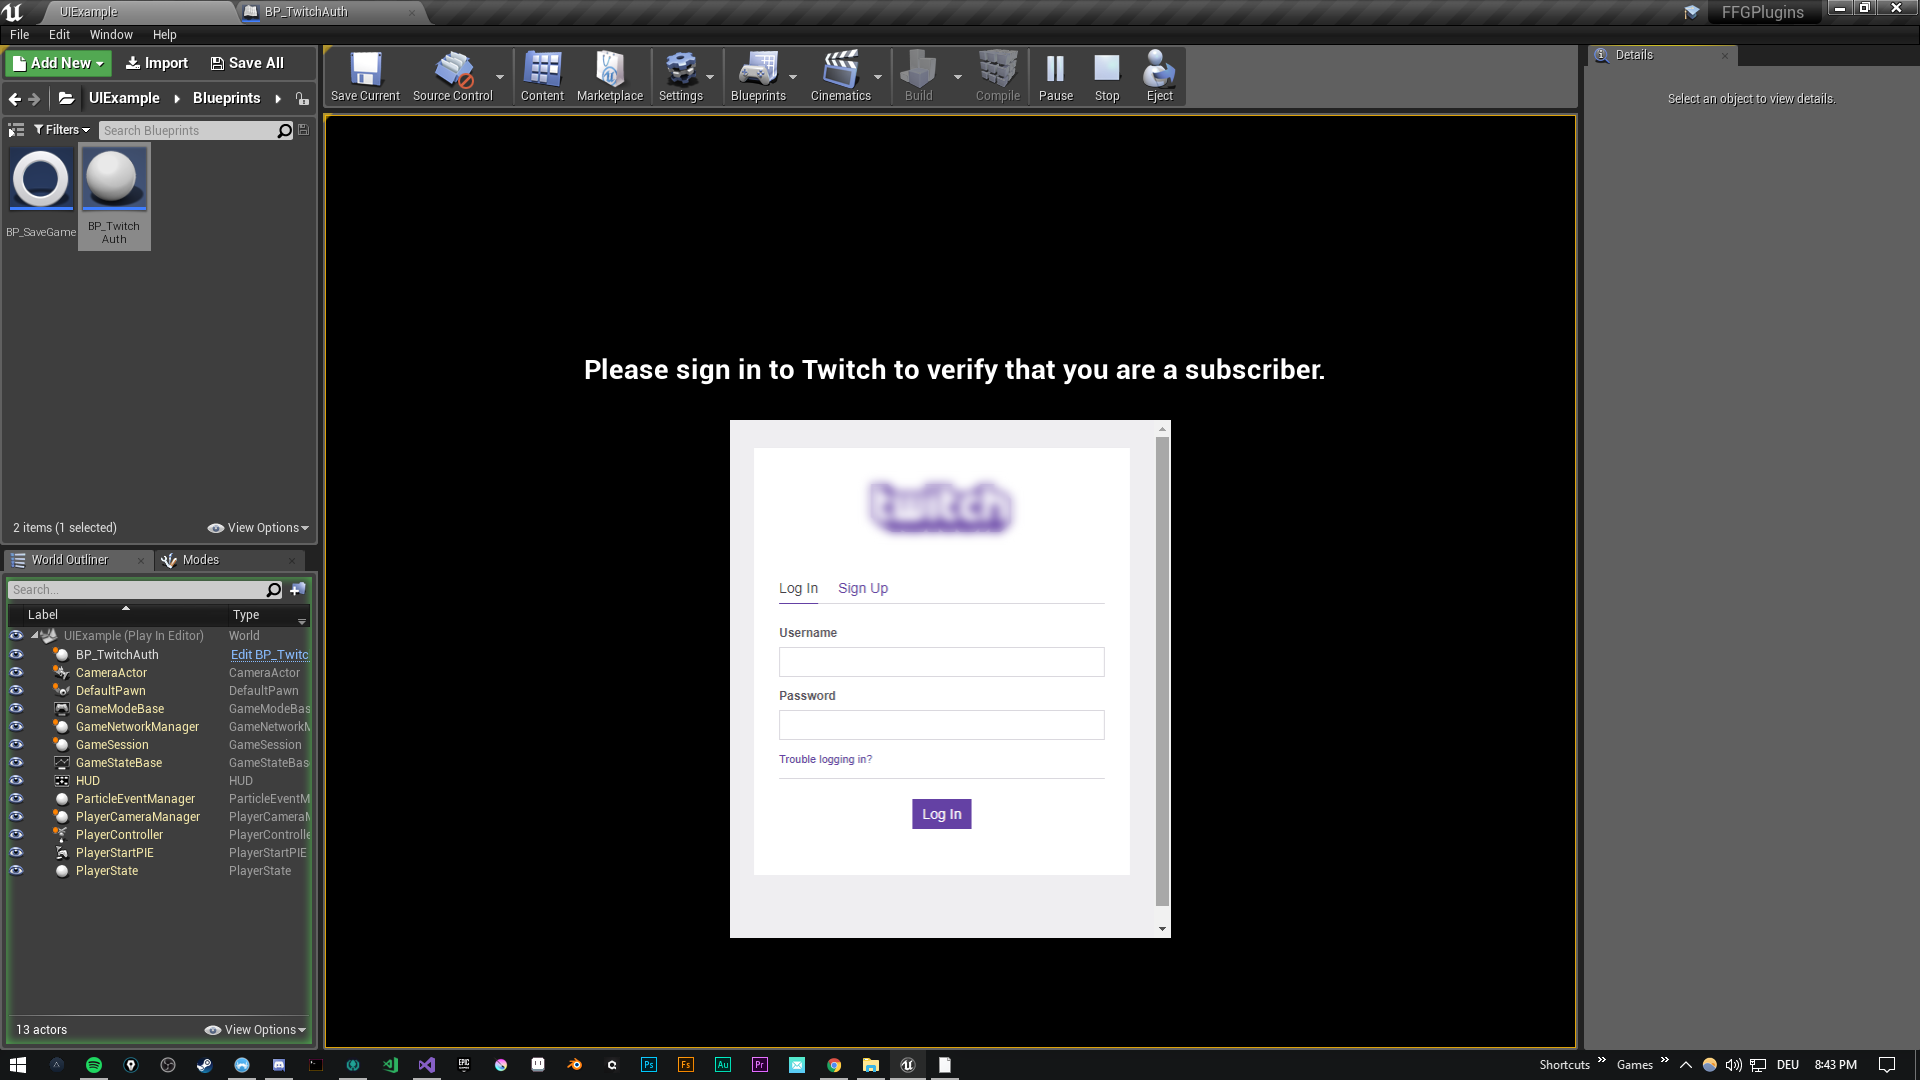 TwitchAuth